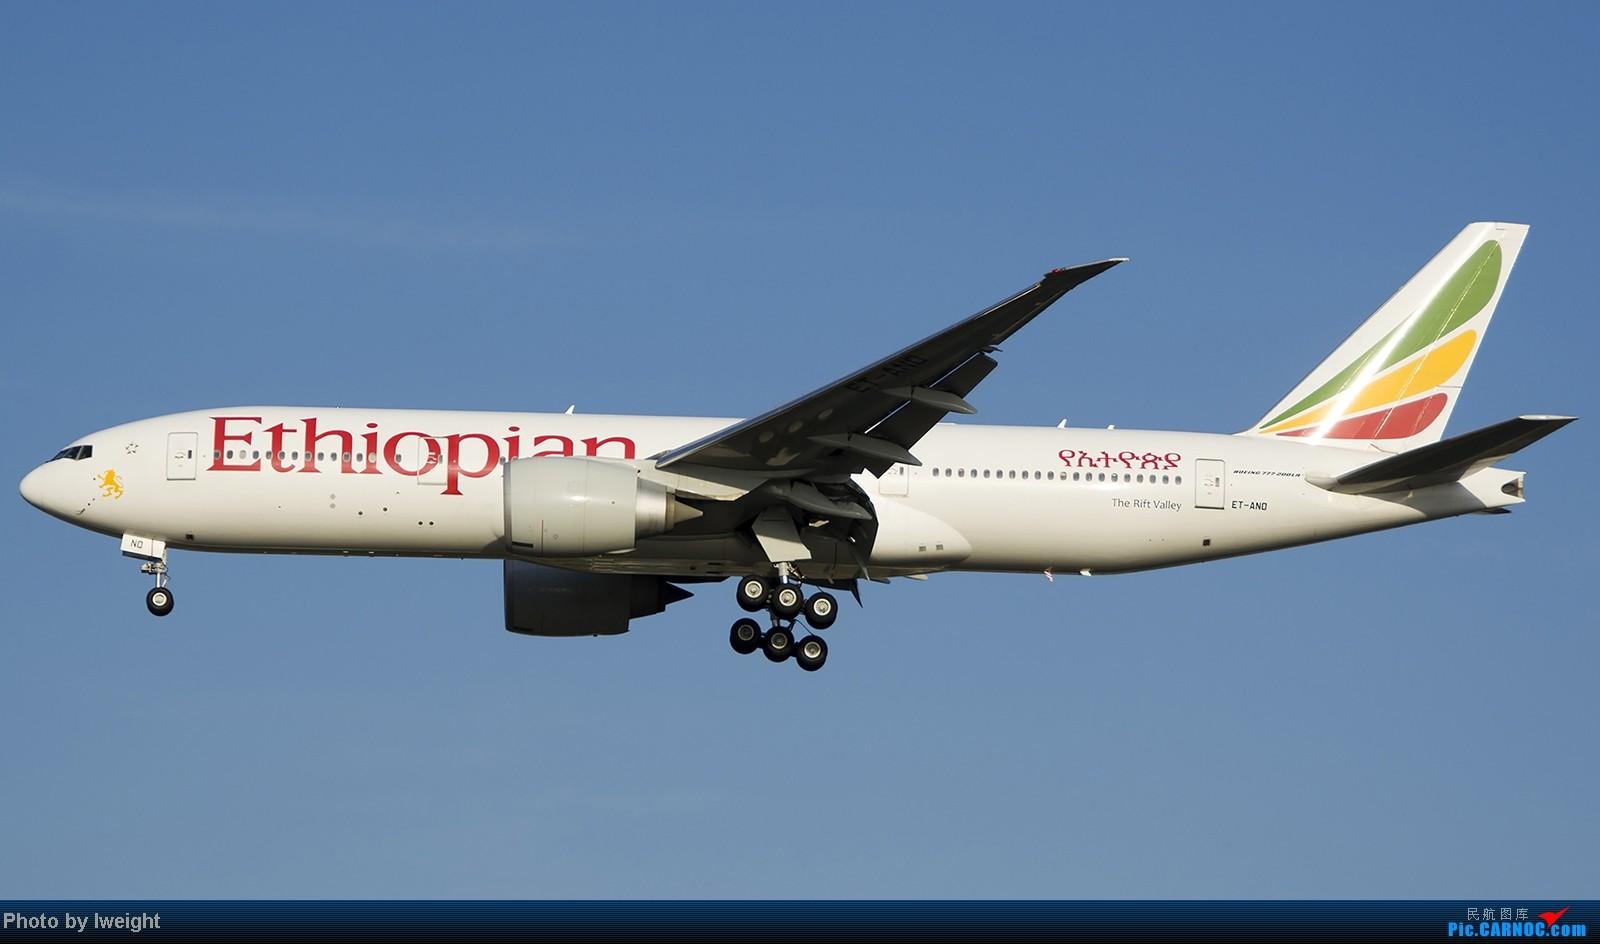 Re:[原创]难得赶上PEK周末好天气,各种常见机型都有收获 BOEING 777-200LR ET-ANO 中国北京首都机场